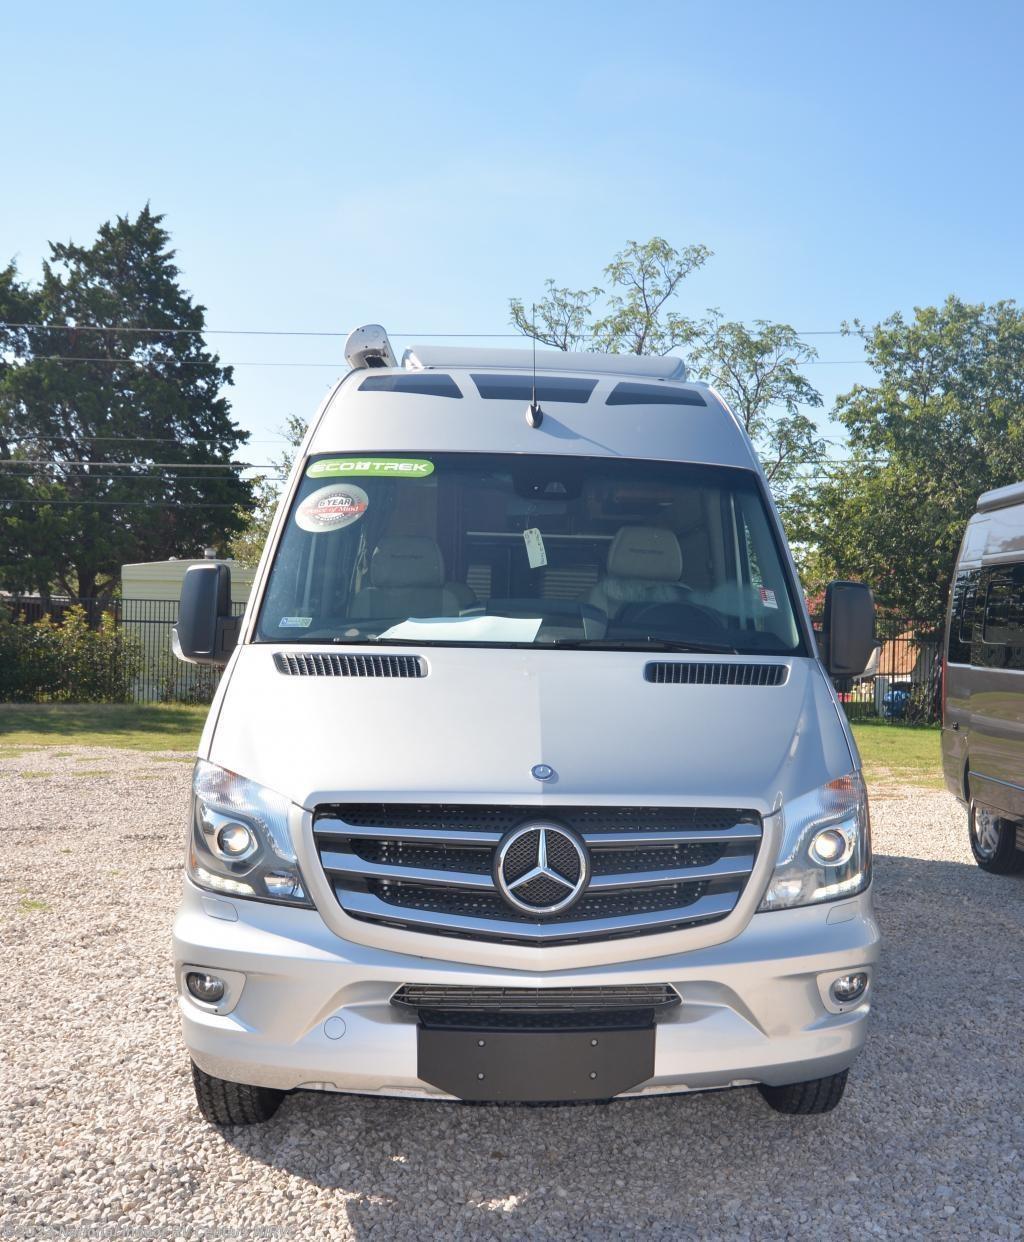 2017 Roadtrek Rv Rs Adventurous For Sale In Lewisville Tx